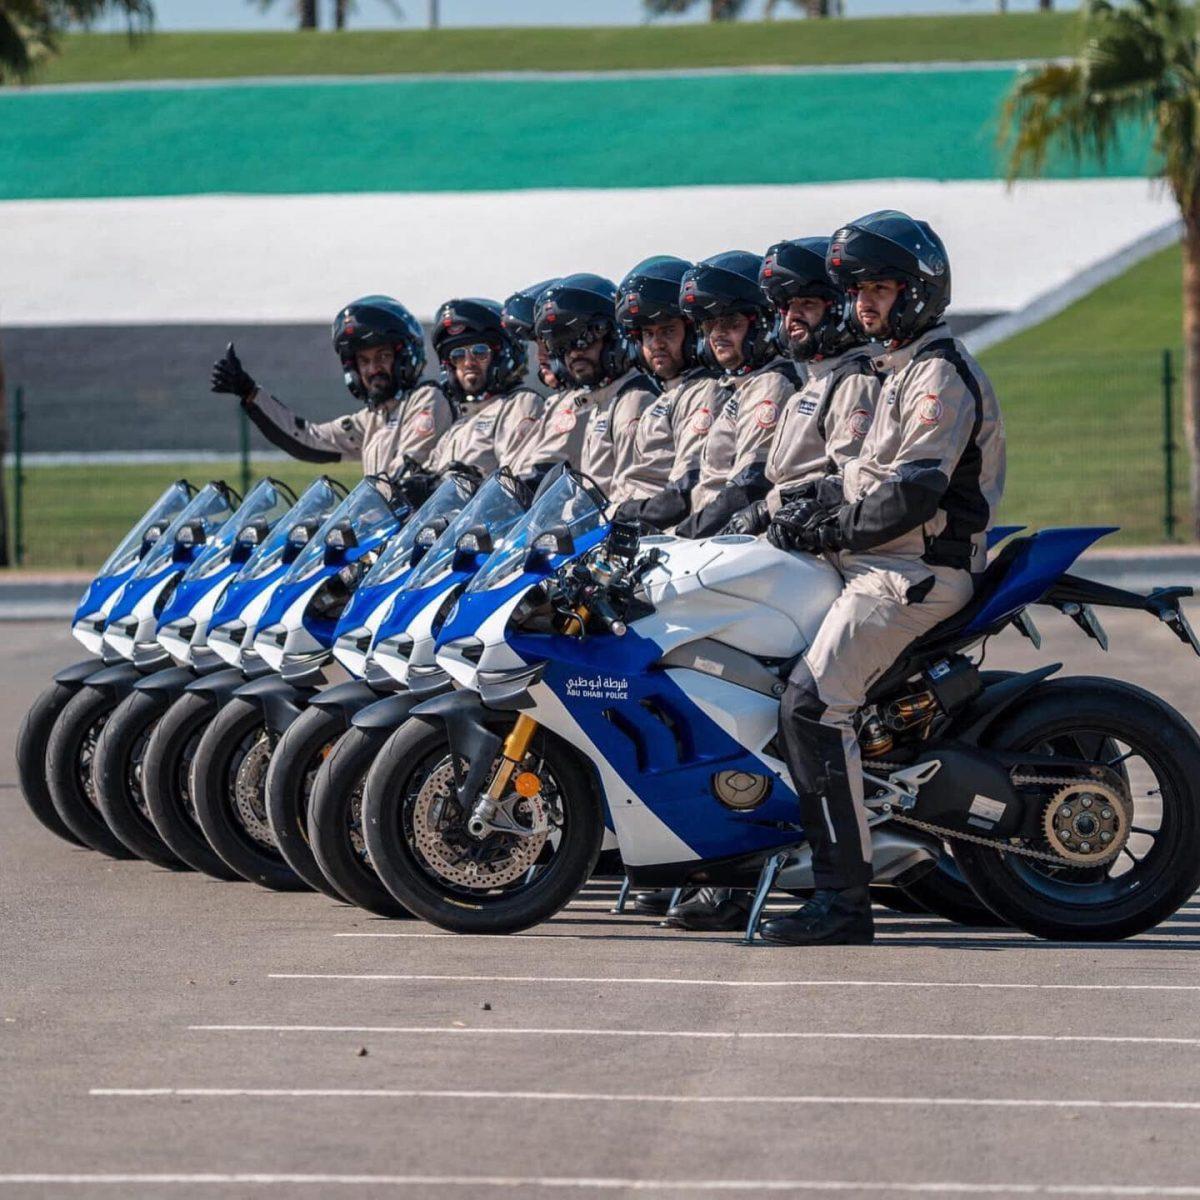 La Ducati Panigale V4 R a rejoint la flotte de Abu Dhabi police